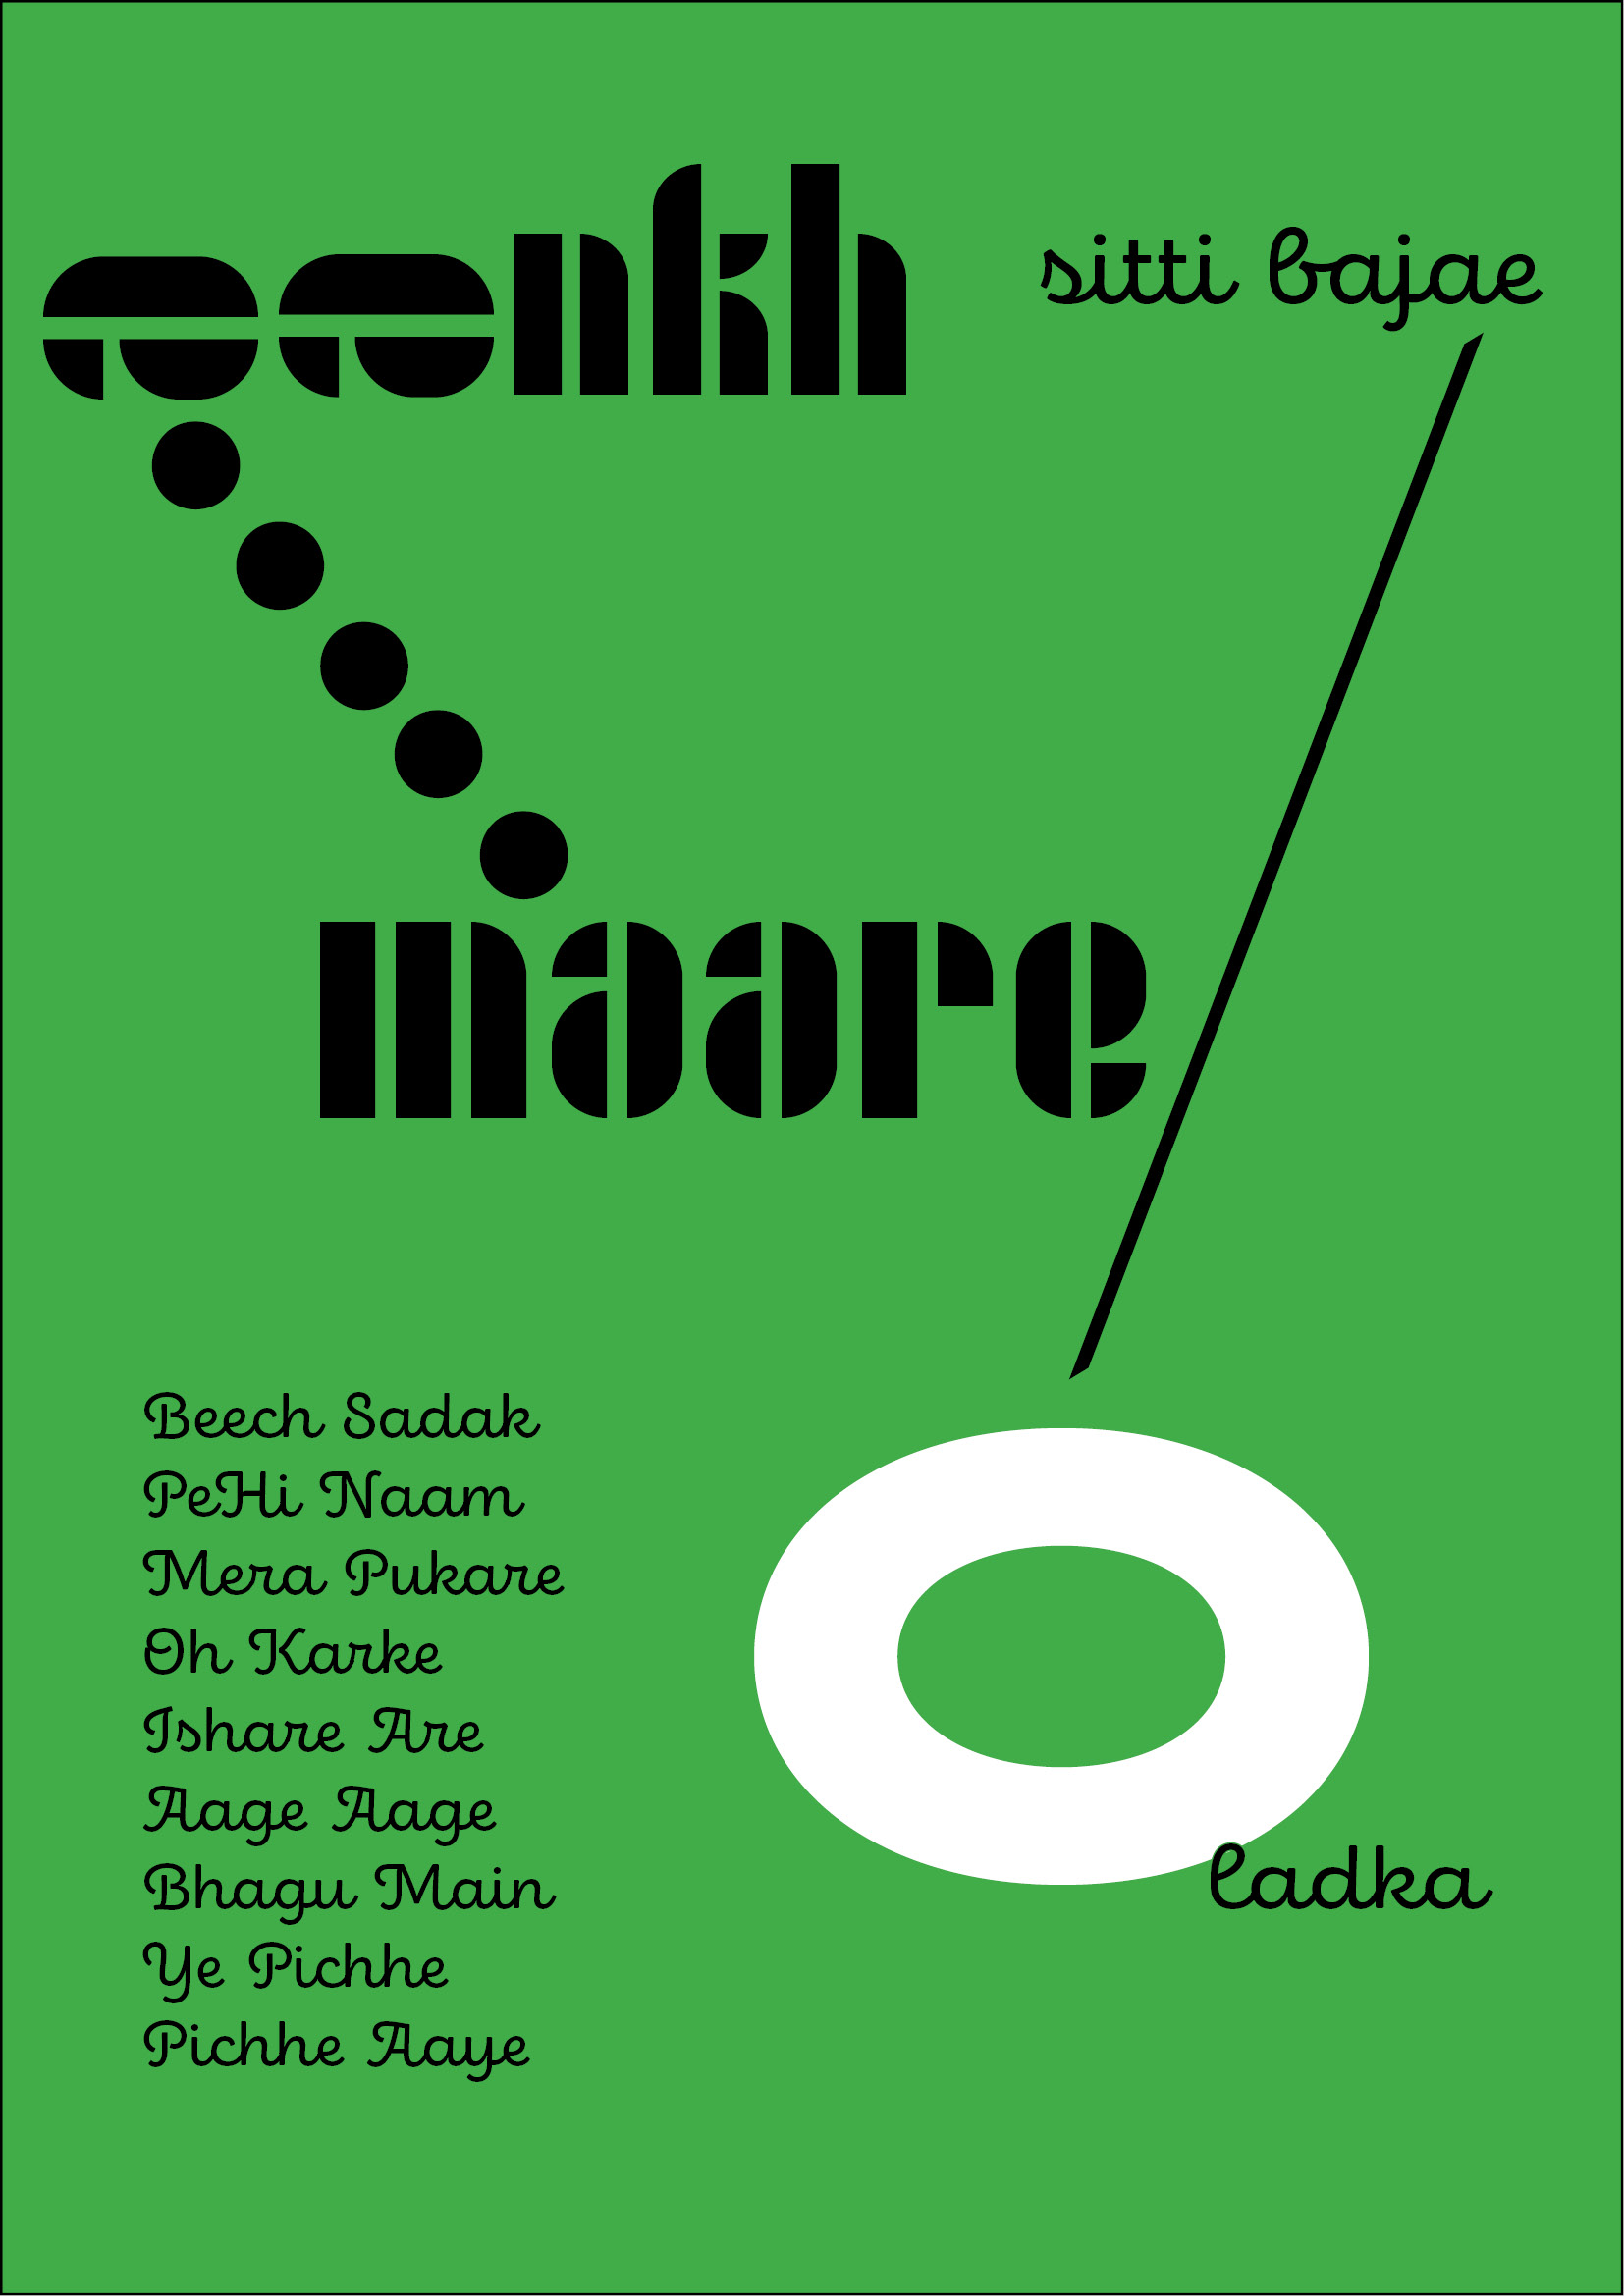 Poster designed using either Cheesy bollywood lyrics or Indian hip lyrics/ Artists